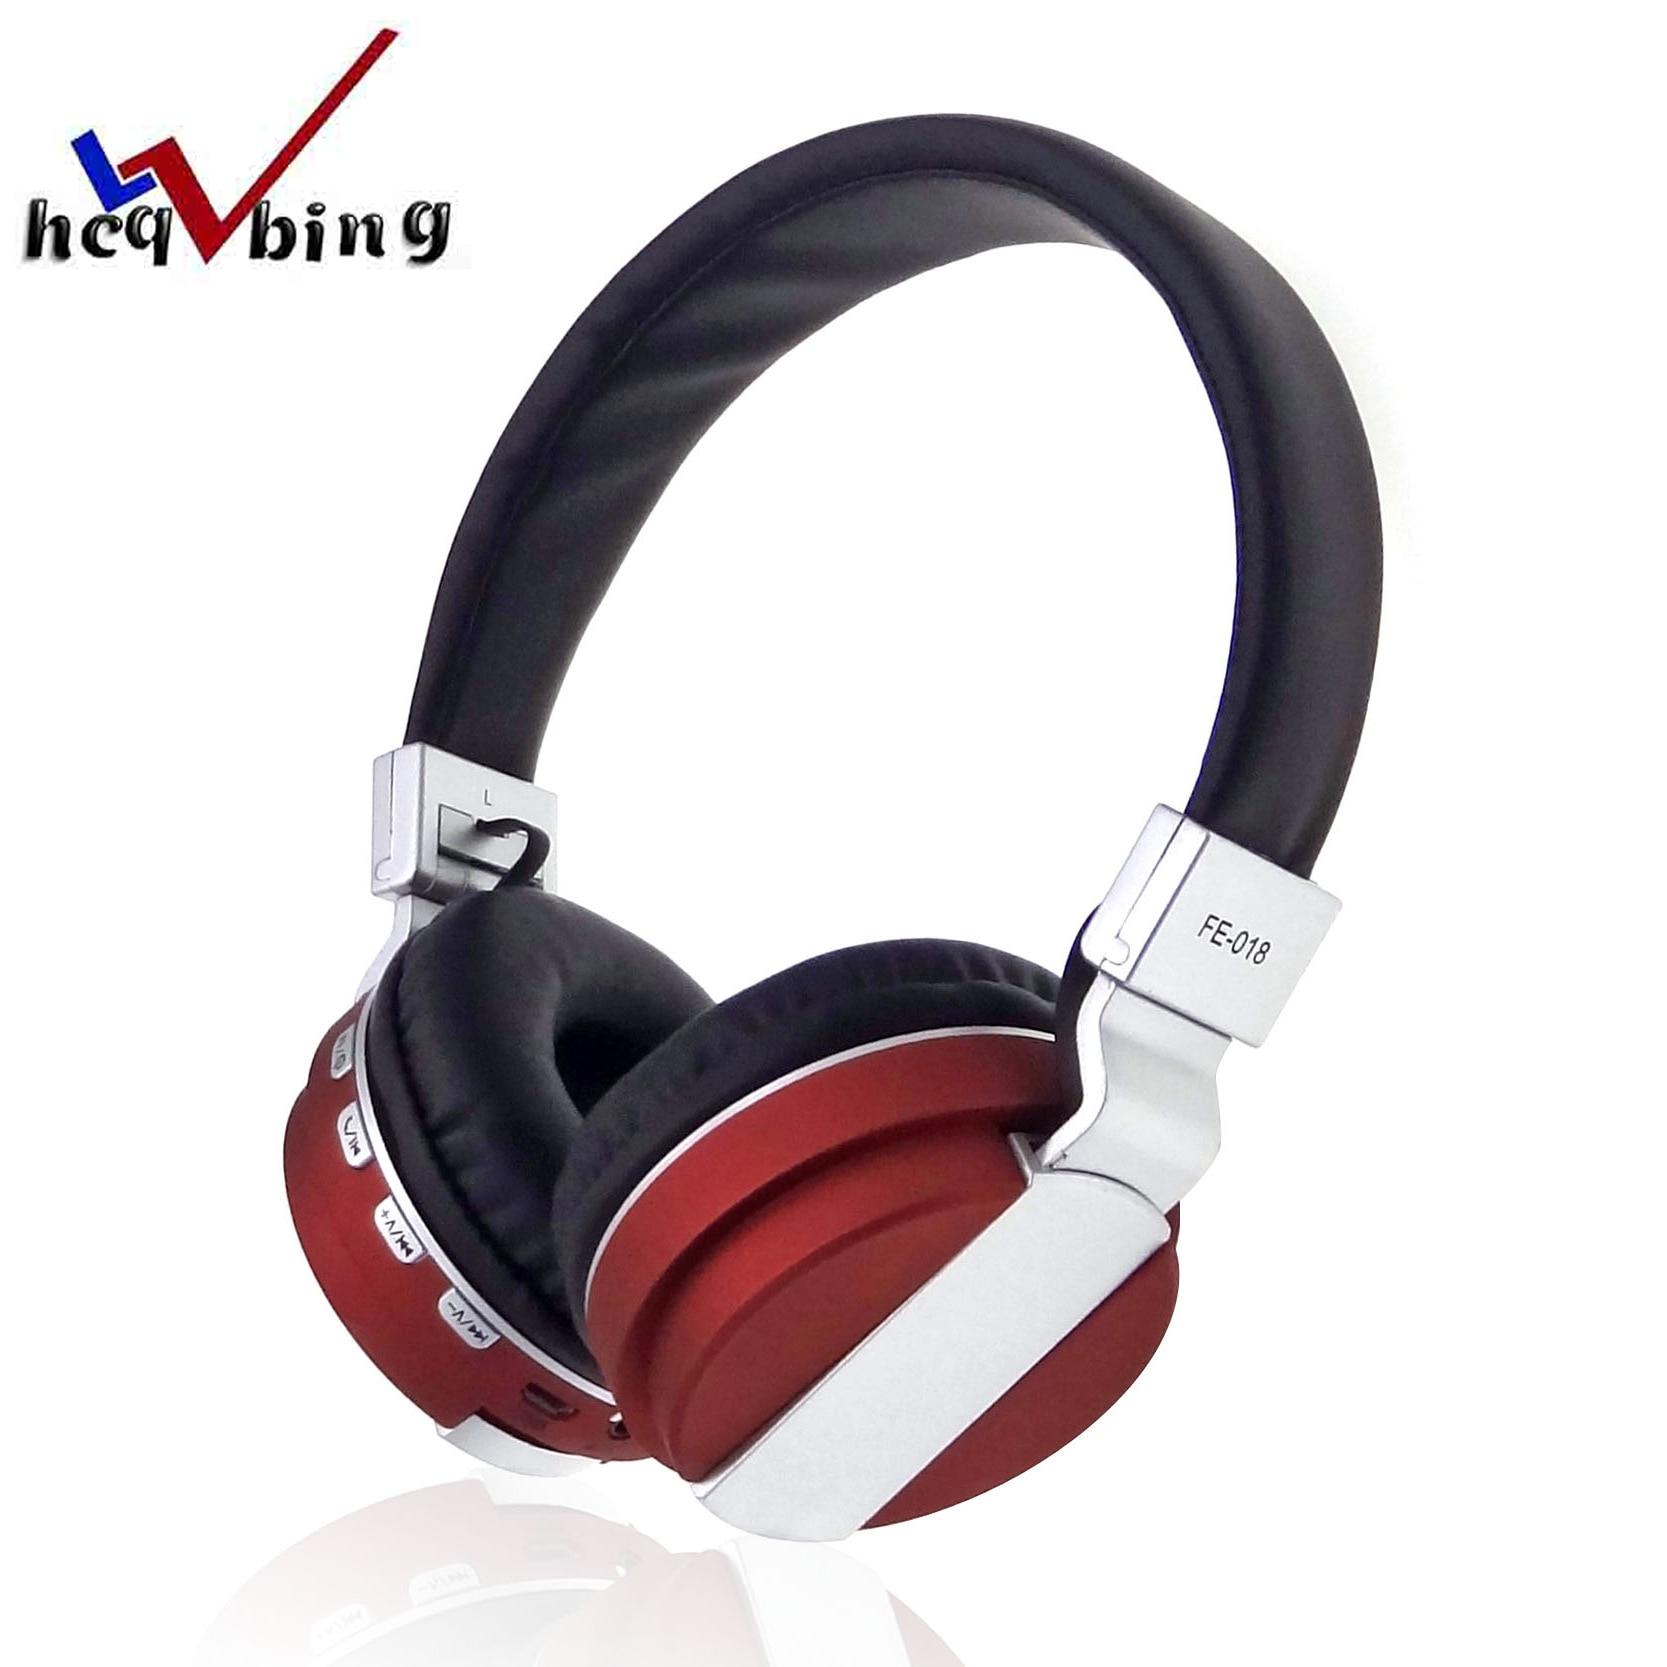 HCQWBING New Foldable headphone wireless NFC bluetooth 4.2 + micro sd + FM Multifunction stereo mic headset Handsfree microphone